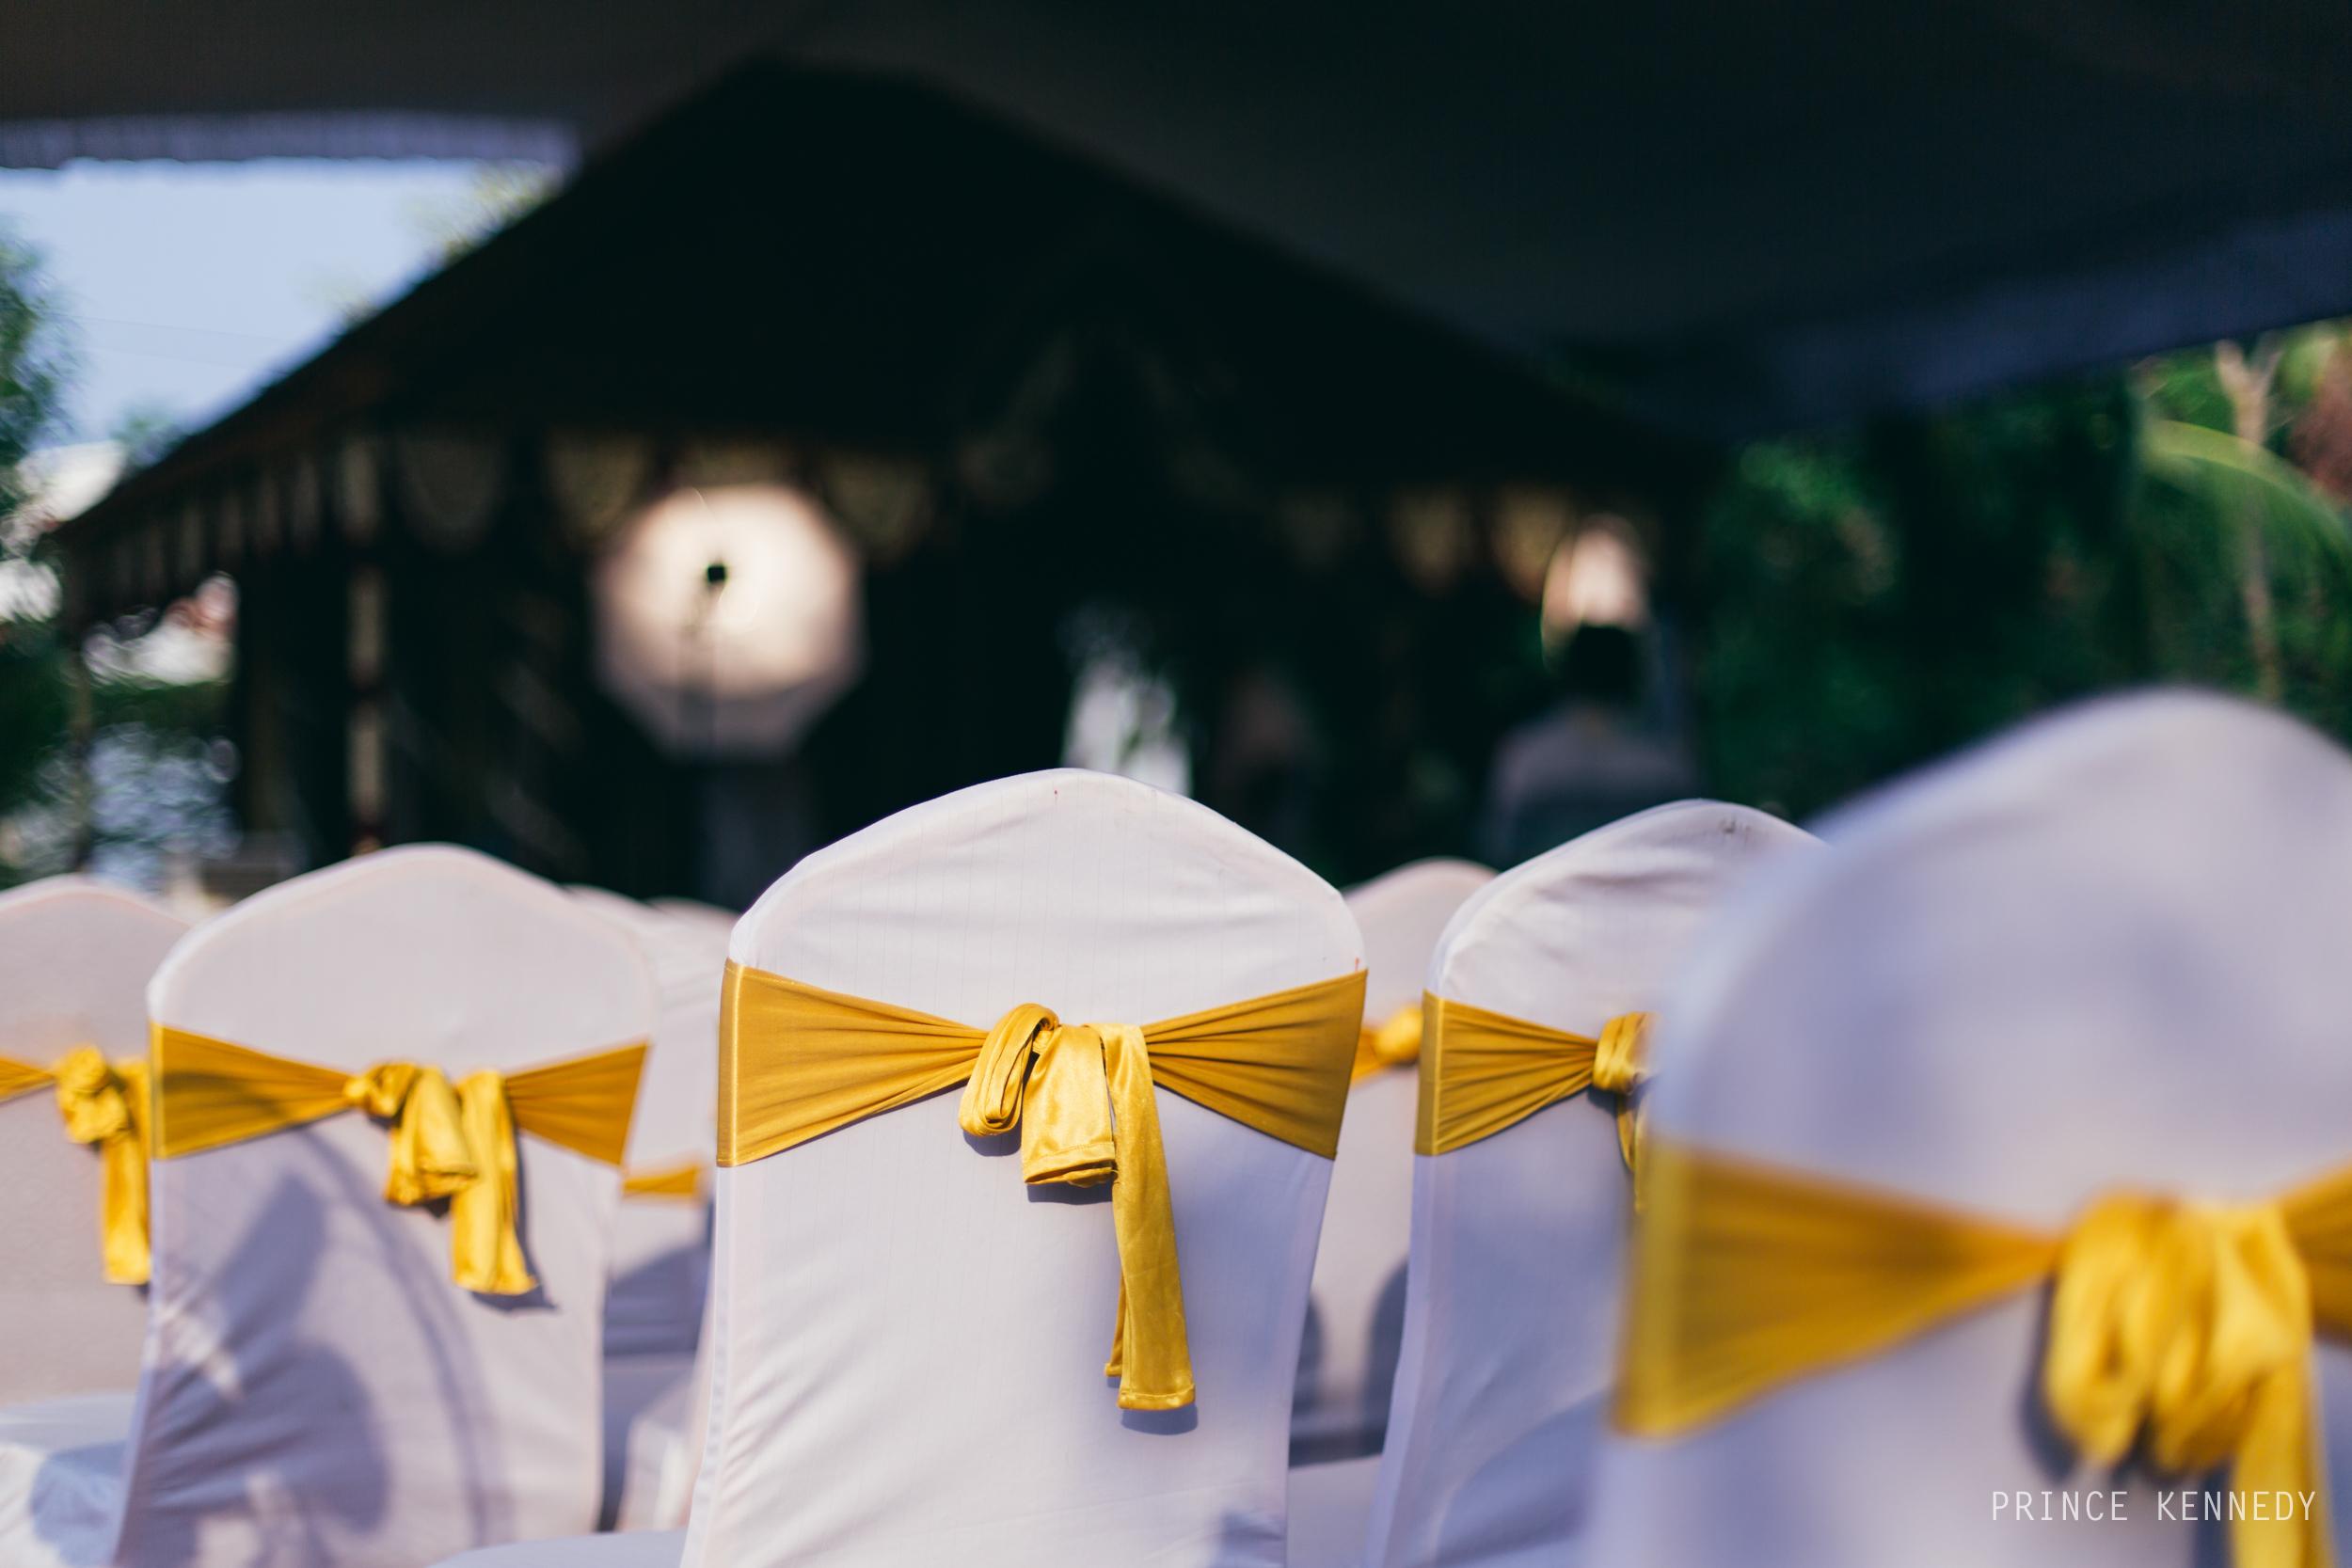 Athmajja-Nithesh-Engagement-Couple-Portrait-Portraiture-Wedding-Couple-Portrait-Chennai-Photographer-Candid-Photography-Destination-Best-Prince-Kennedy-Photography-10.jpg